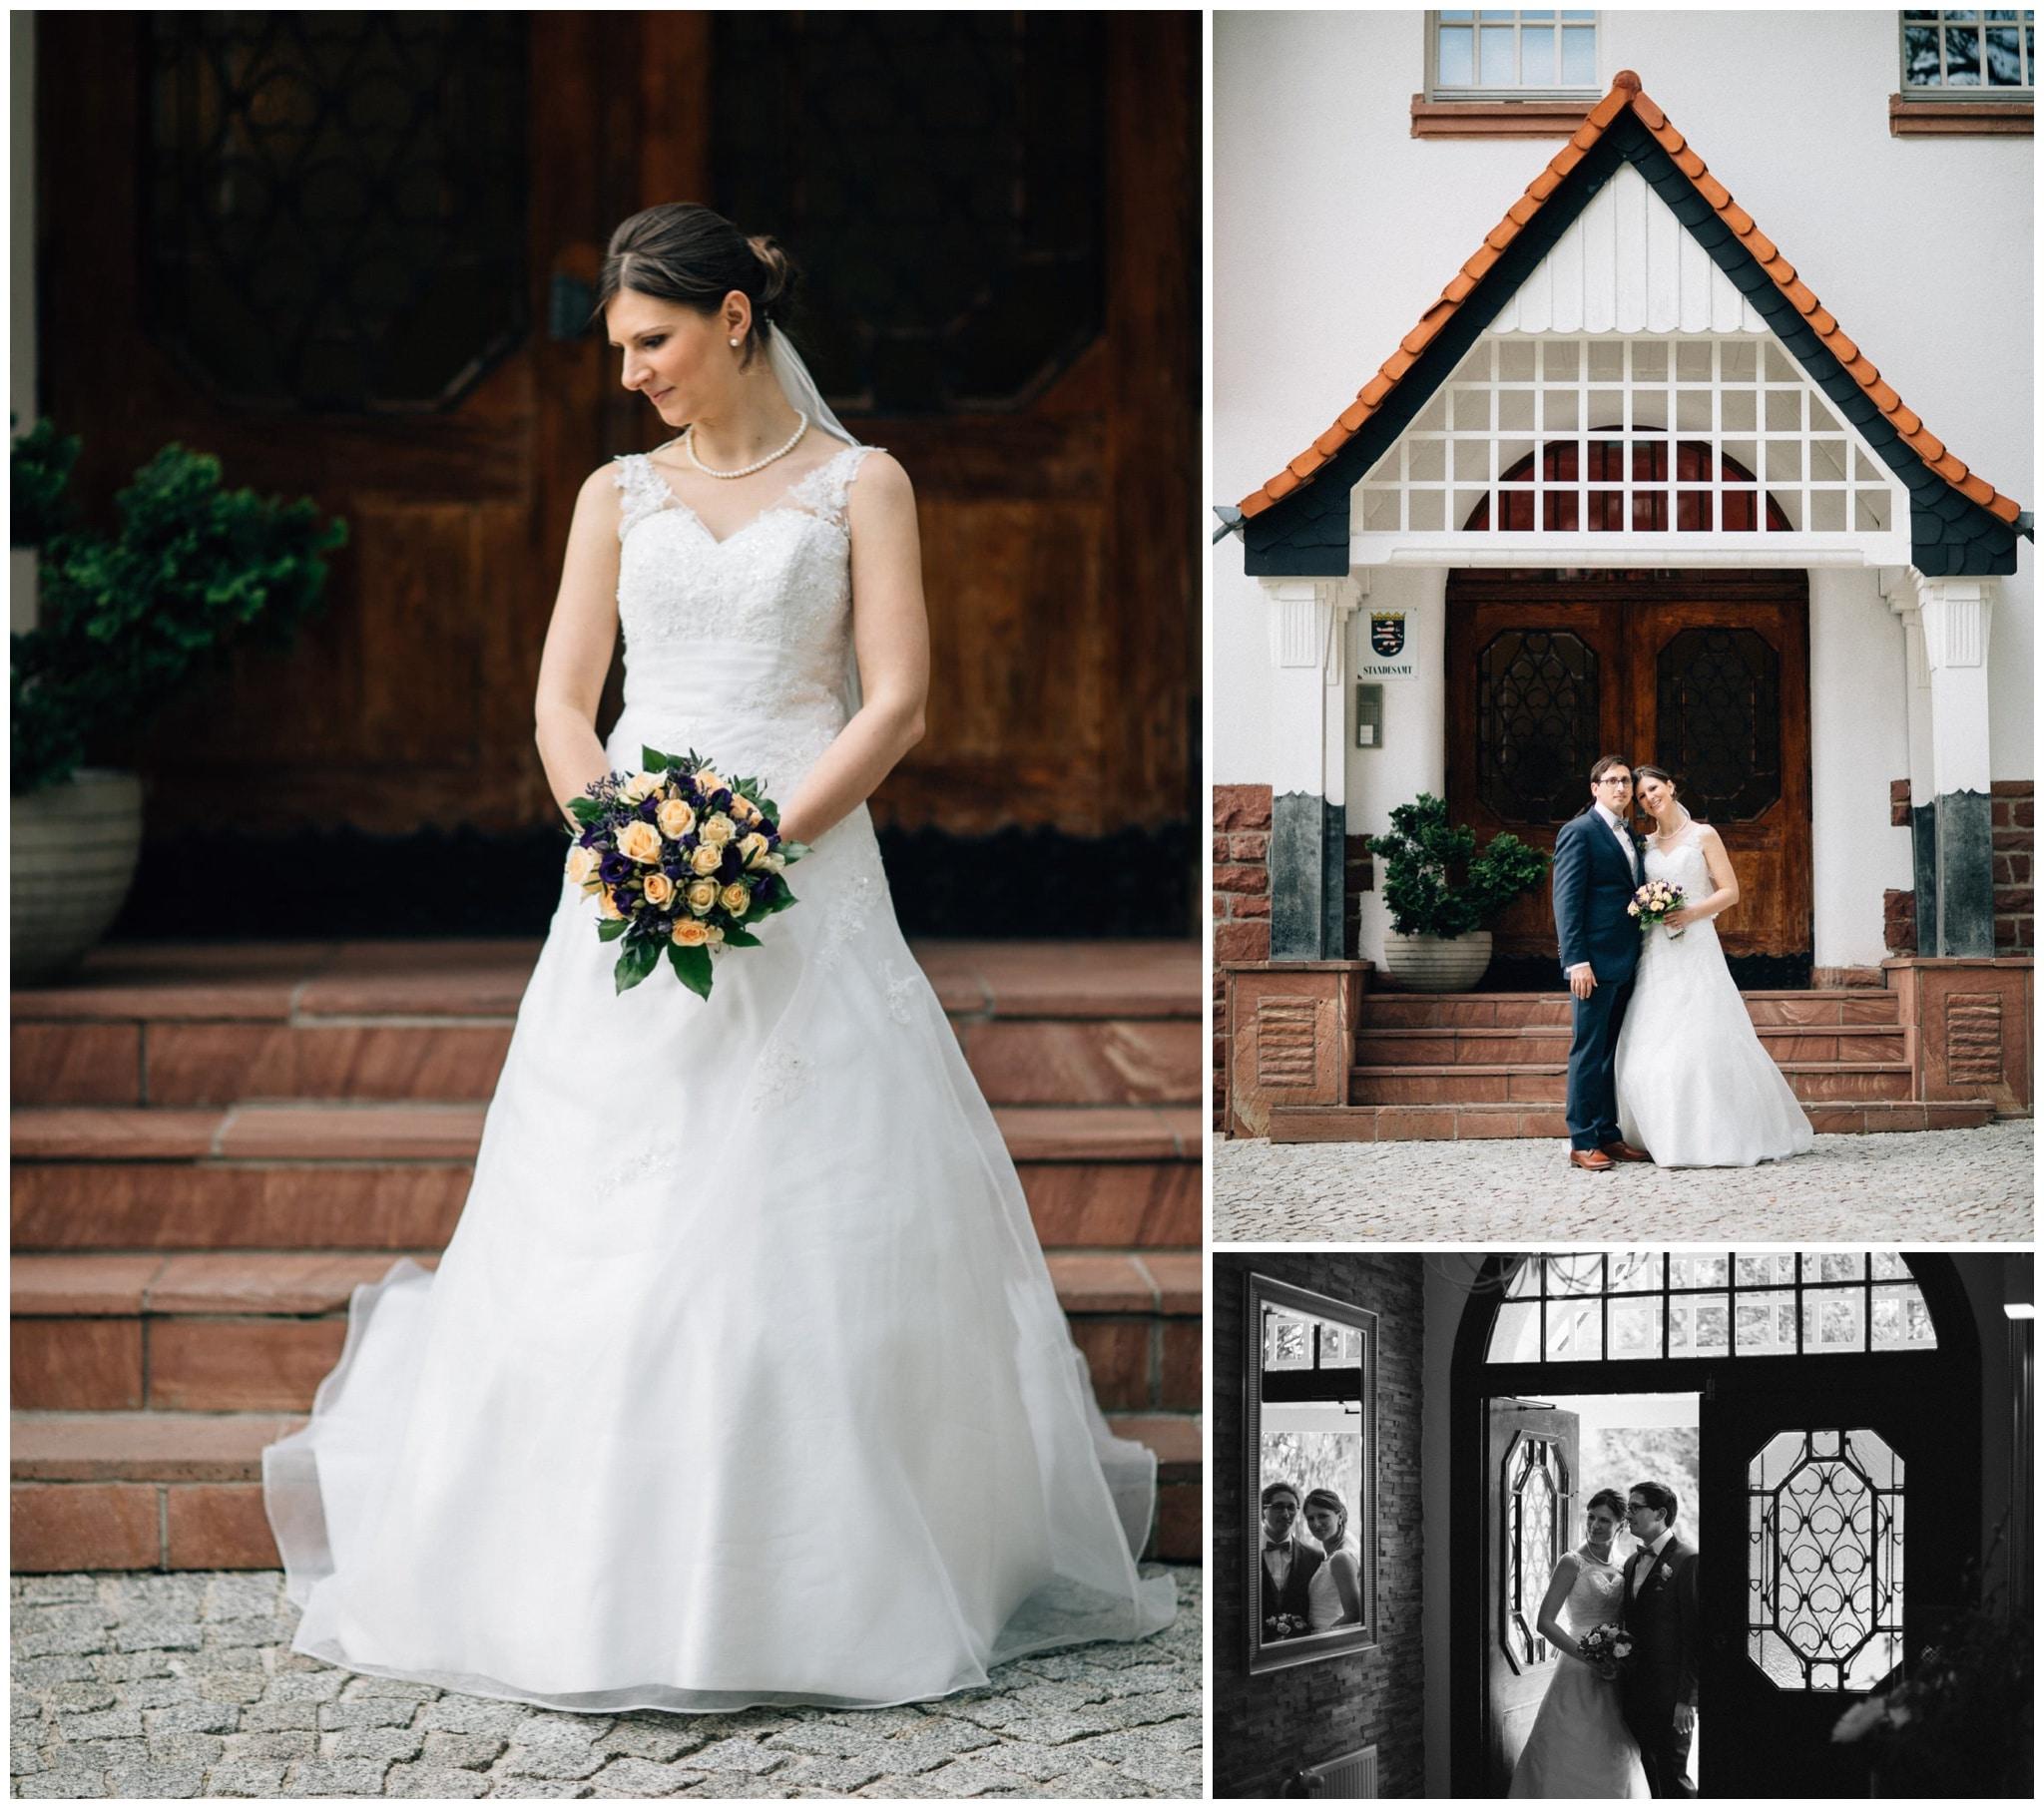 Katharina und Christian Darsberg @mama wedding18